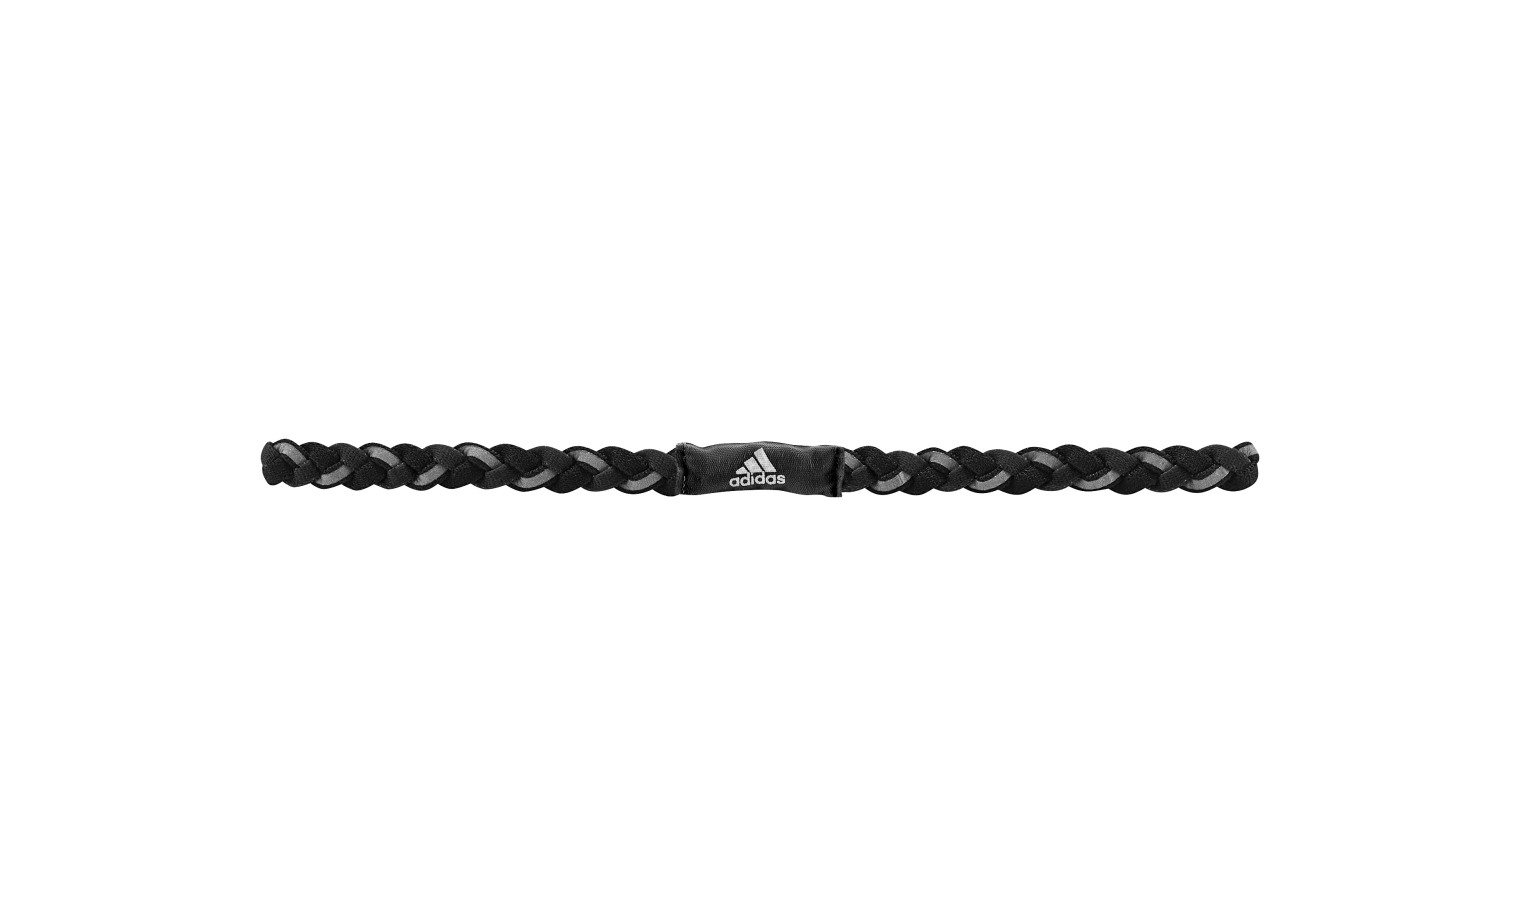 Dámská čelenka adidas RUN HAIRBANDS černá  421be912c2